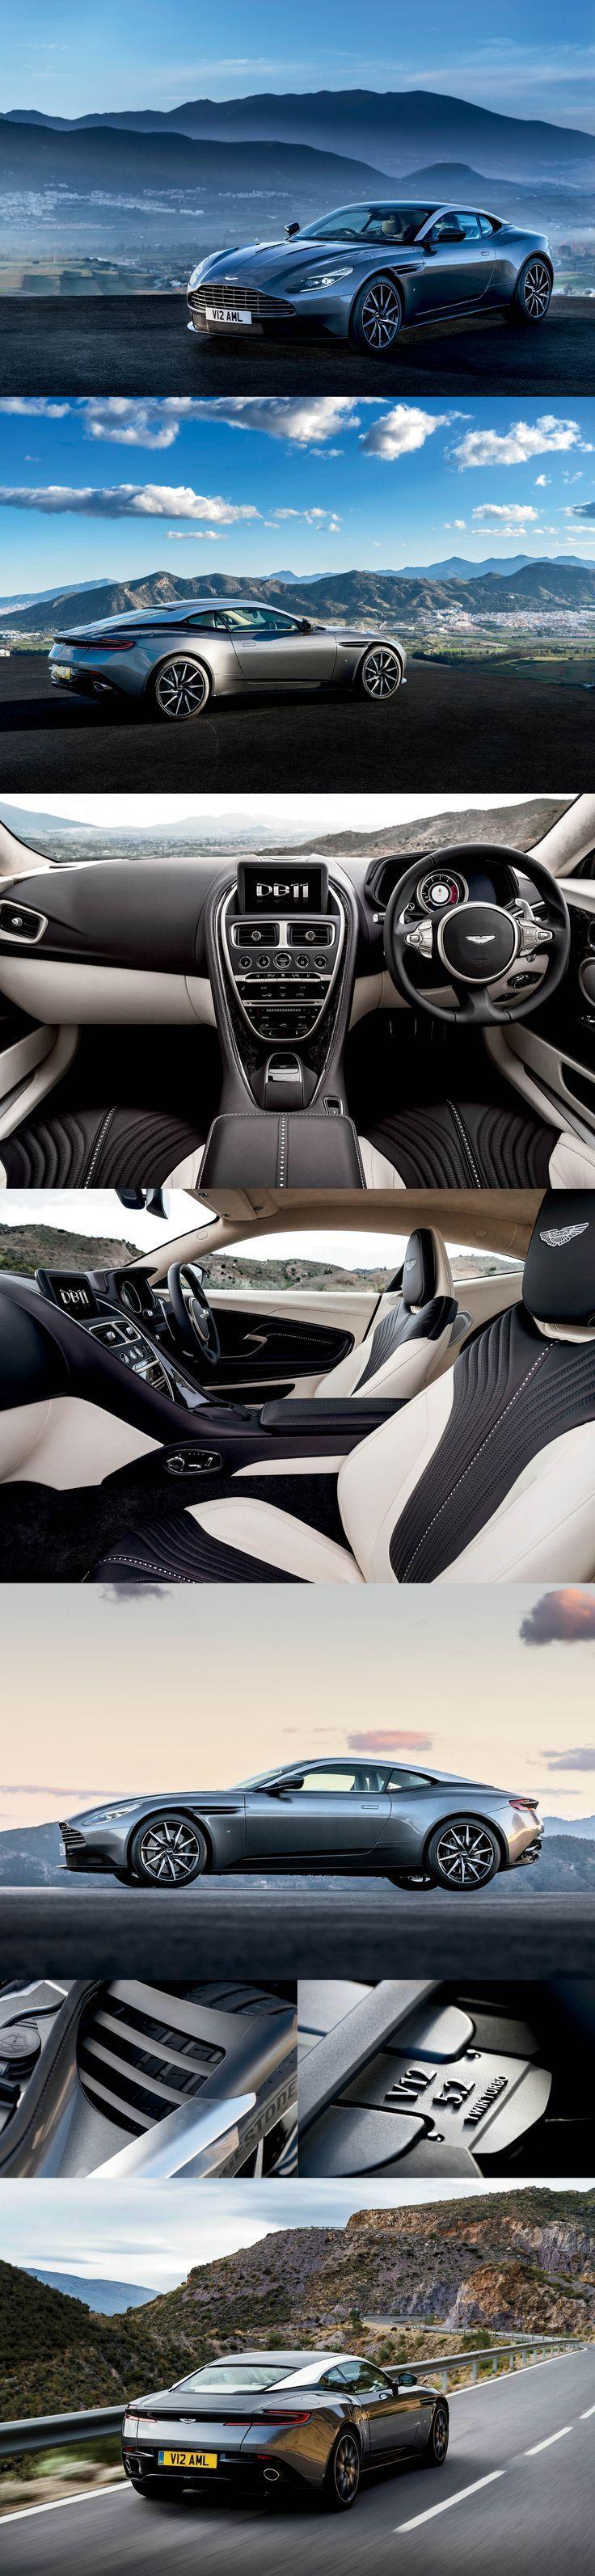 Aston Martin DB11: The Way Forward for the British Marque… #2017 #supercar